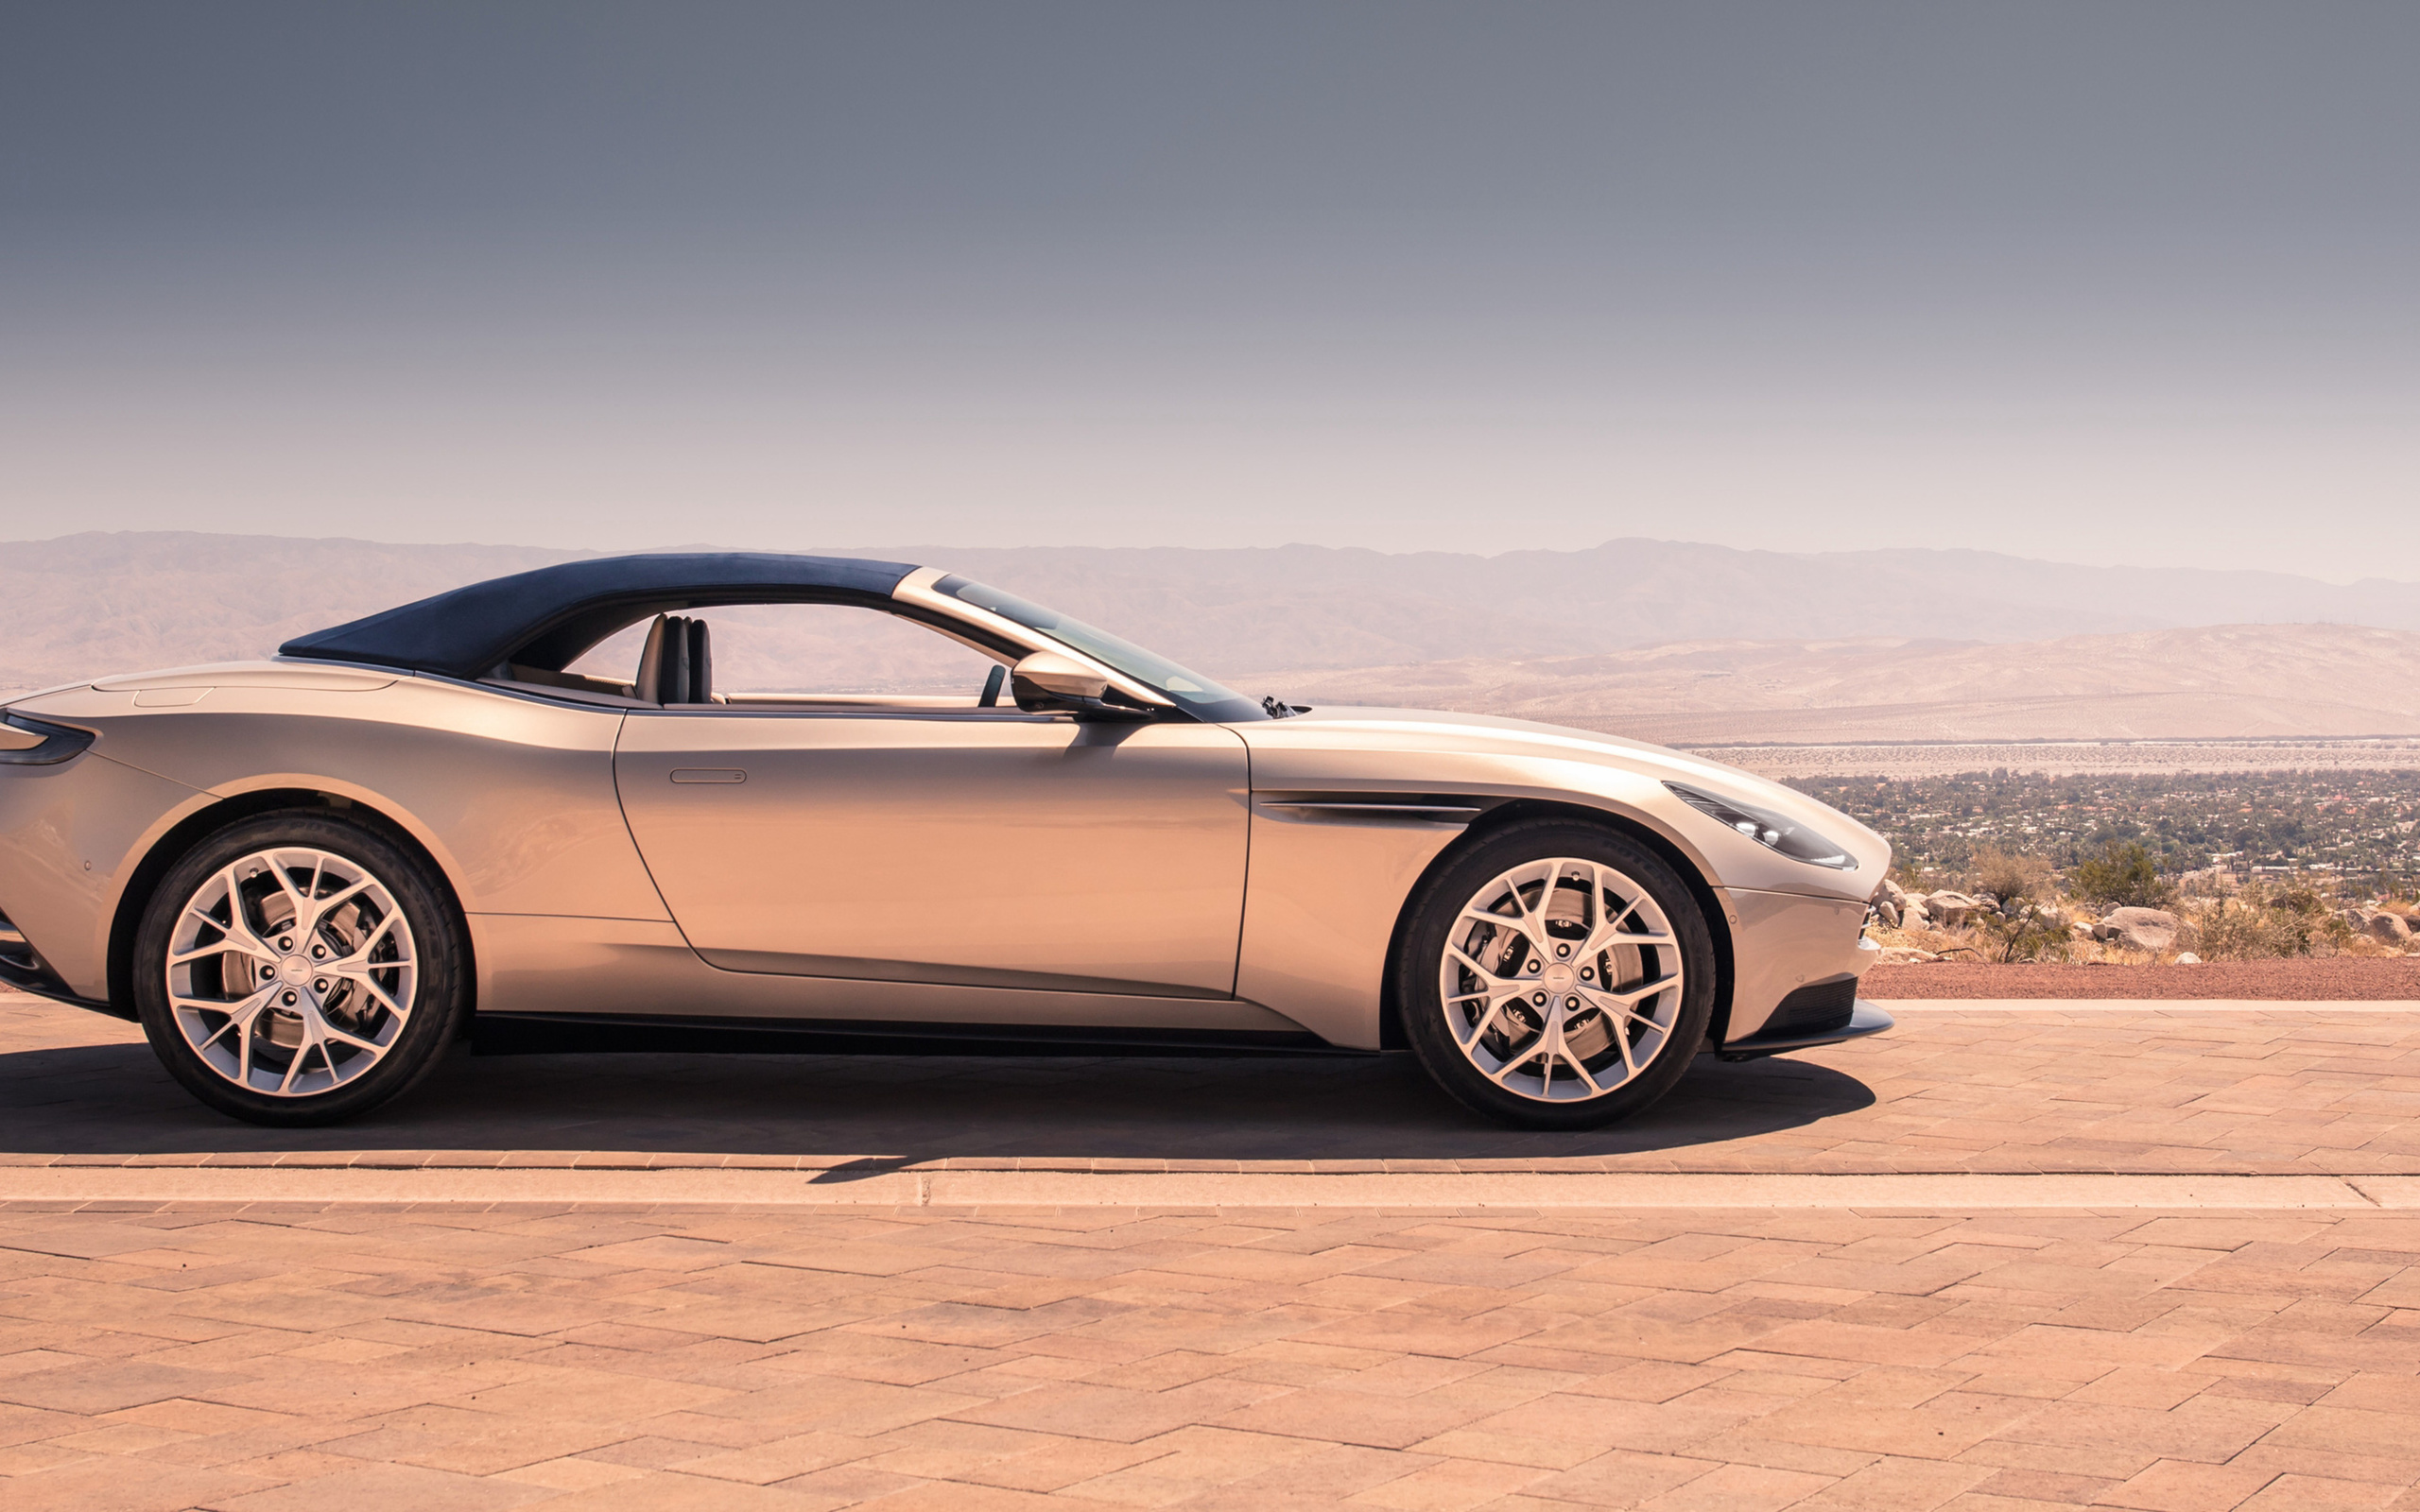 aston martin, luxury, supercar